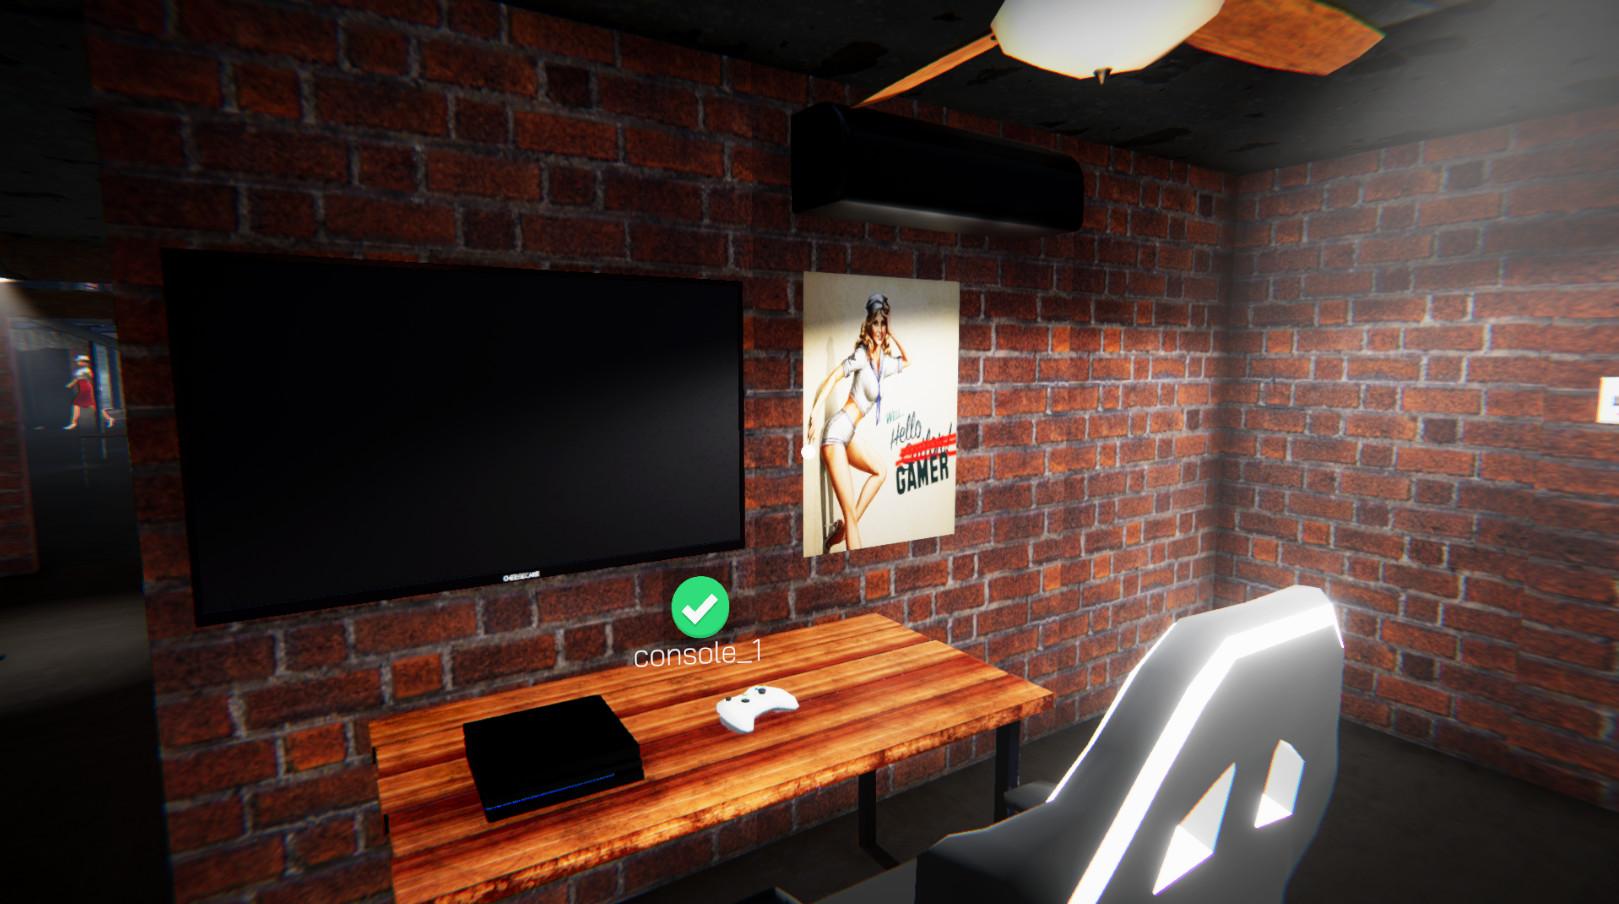 Internet Cafe Simulator on Steam